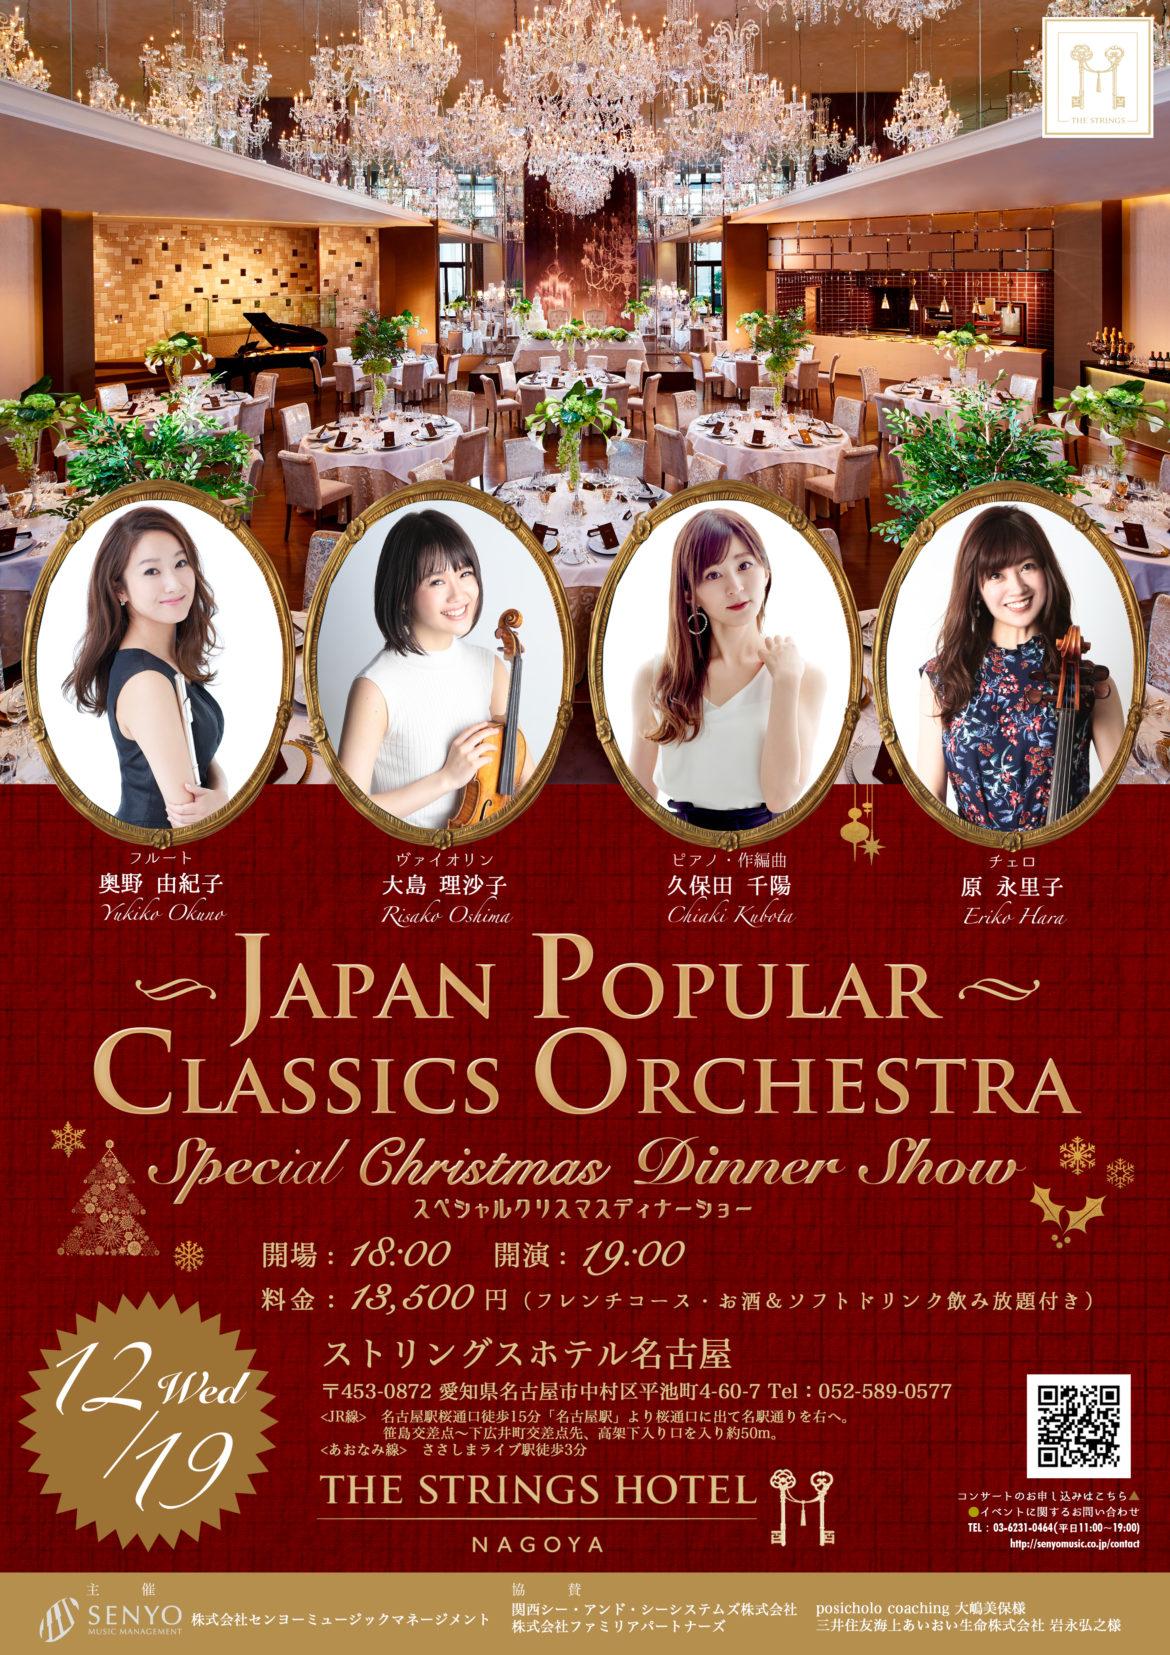 2018.12.19 JPCO スペシャル・クリスマスディナーショー in 名古屋